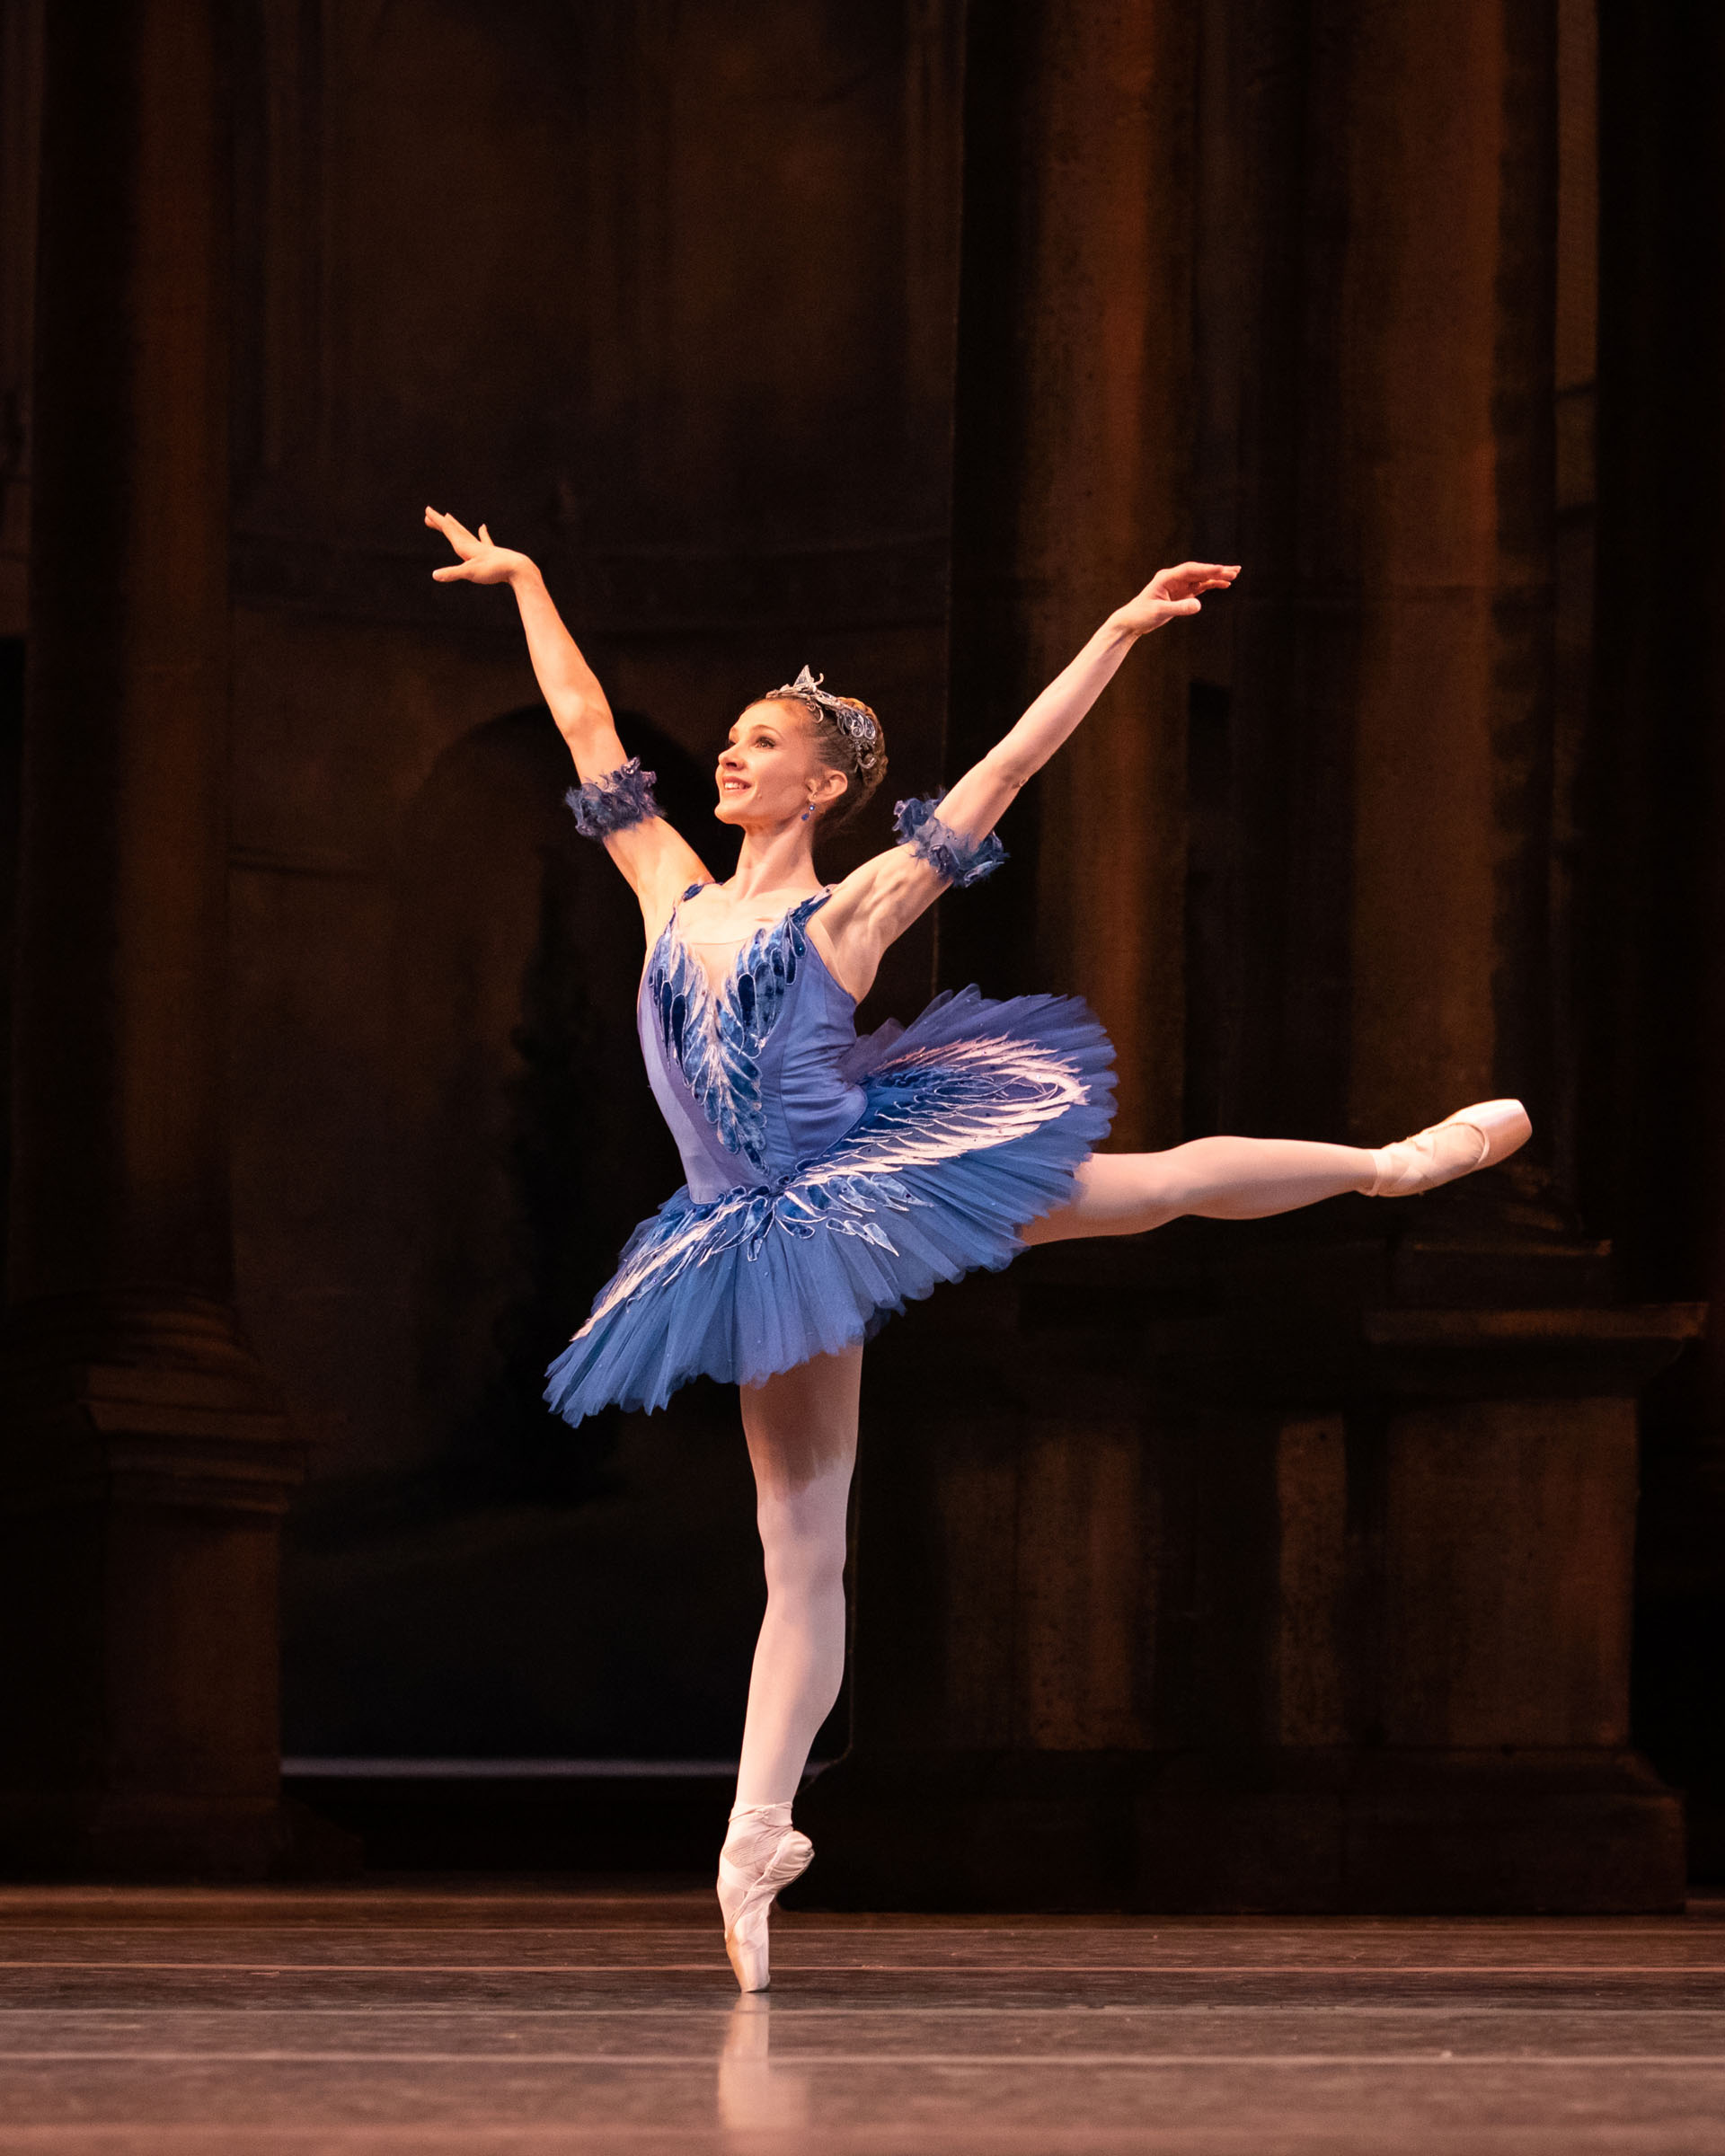 Melissa Hamilton as Princess Florine in The Sleeping Beauty, The Royal Ballet